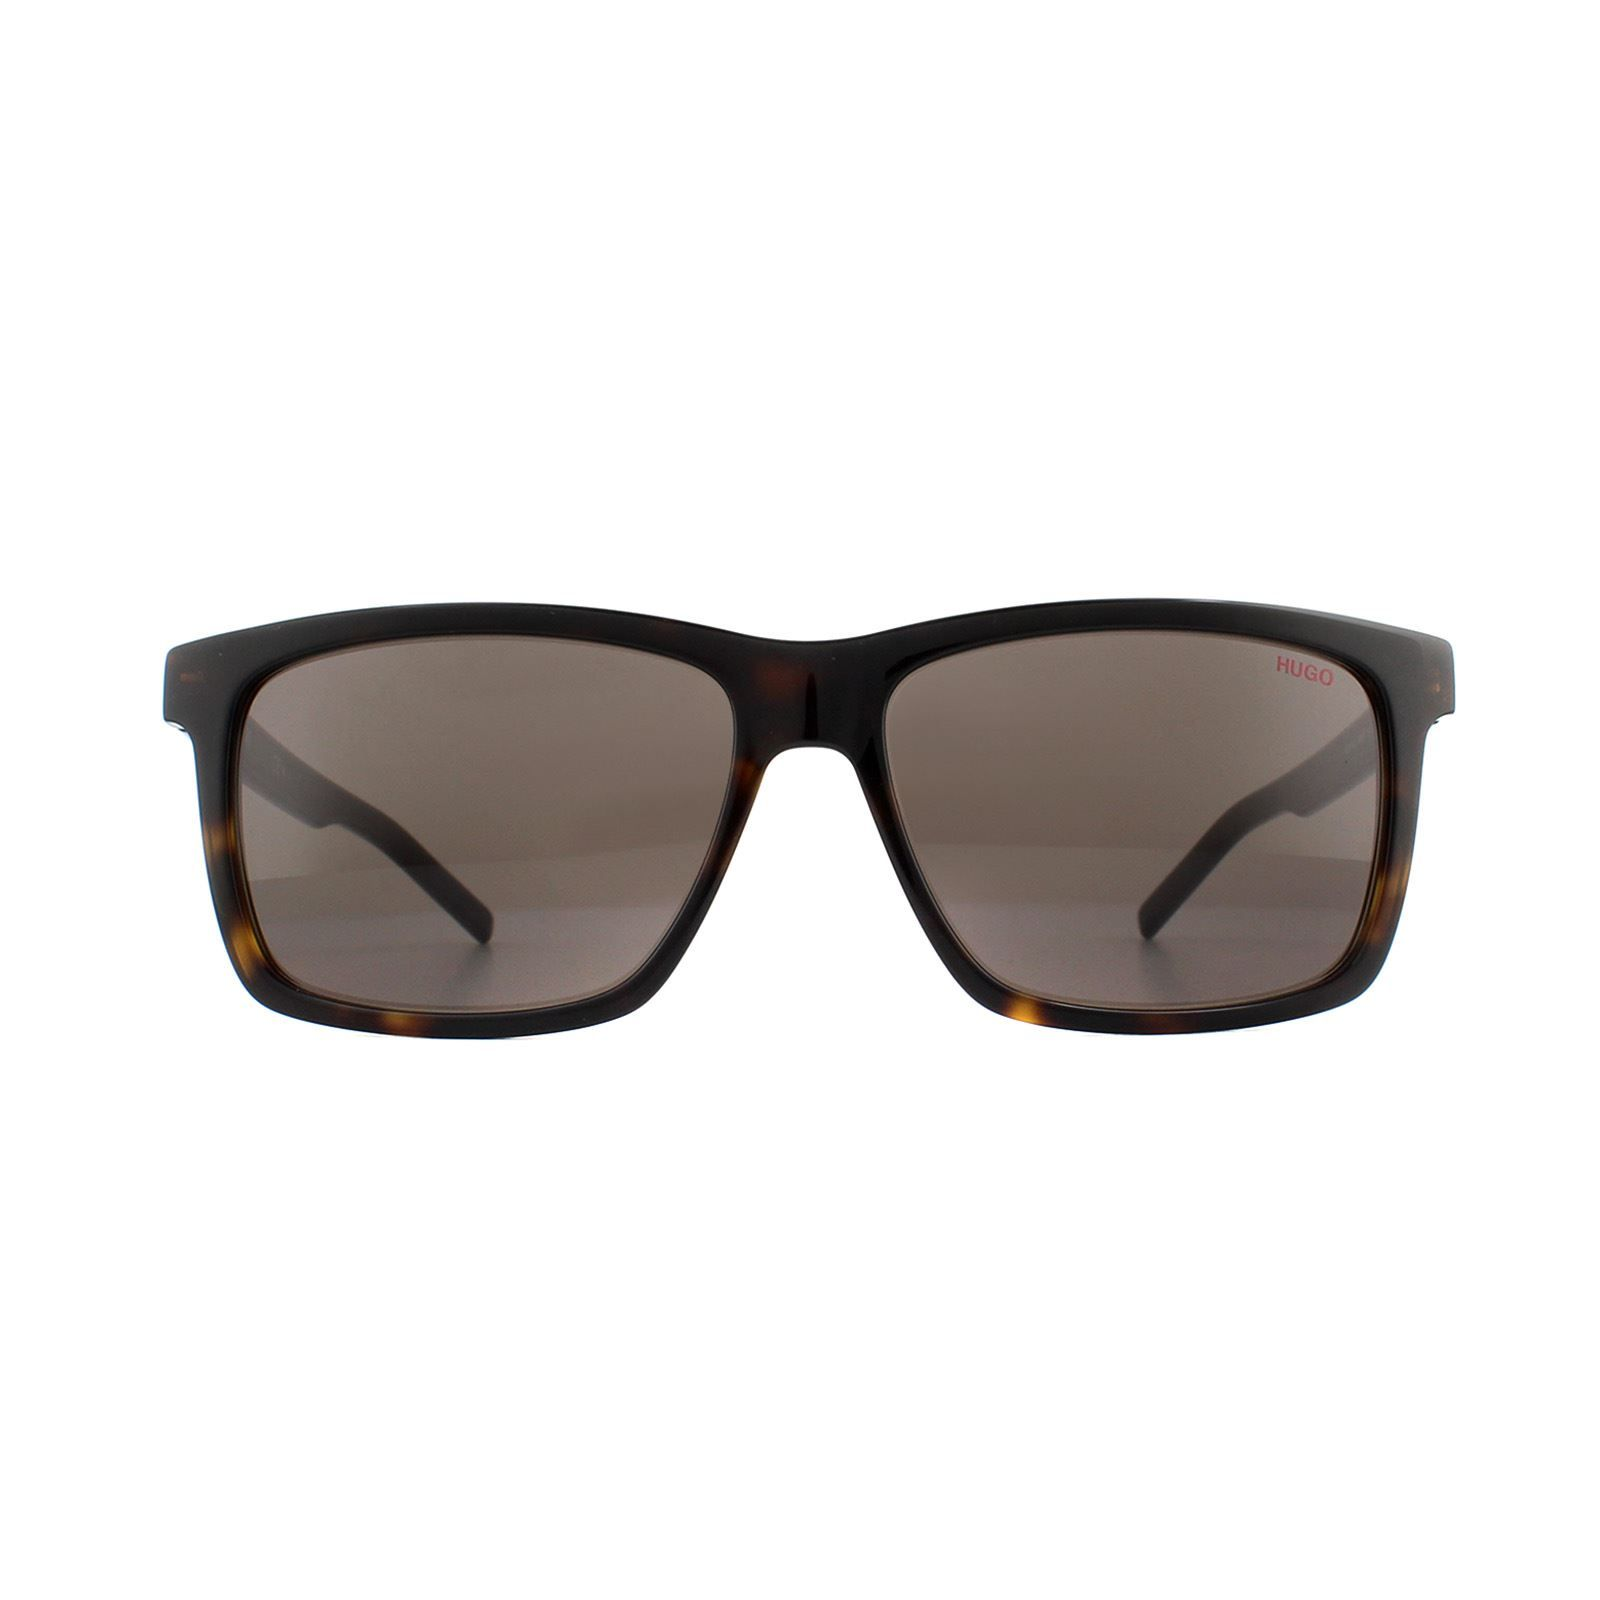 Hugo by Hugo Boss Sunglasses HG 1013/S 086 70 Dark Havana Brown